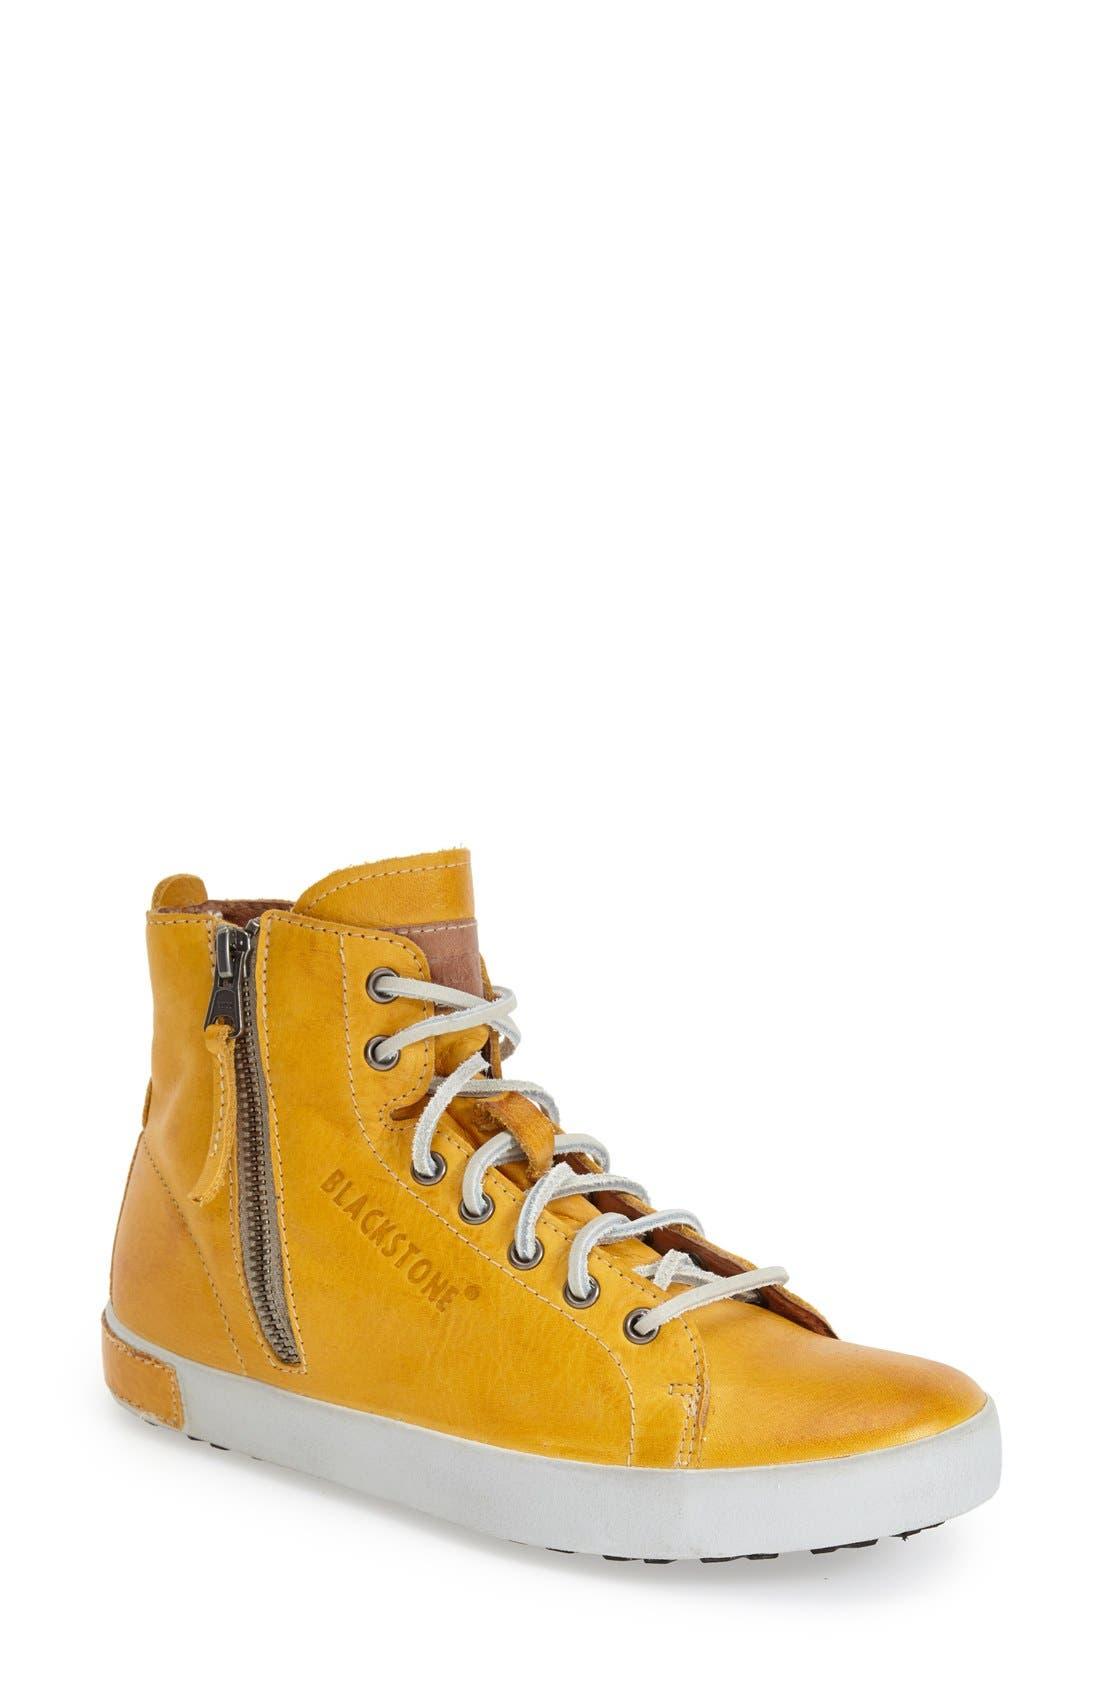 Ql49 Desert Desert FemmeNoir Boots Boots Blackstone FemmeNoir Boots Blackstone Desert Ql49 Blackstone Ql49 H2WI9ED